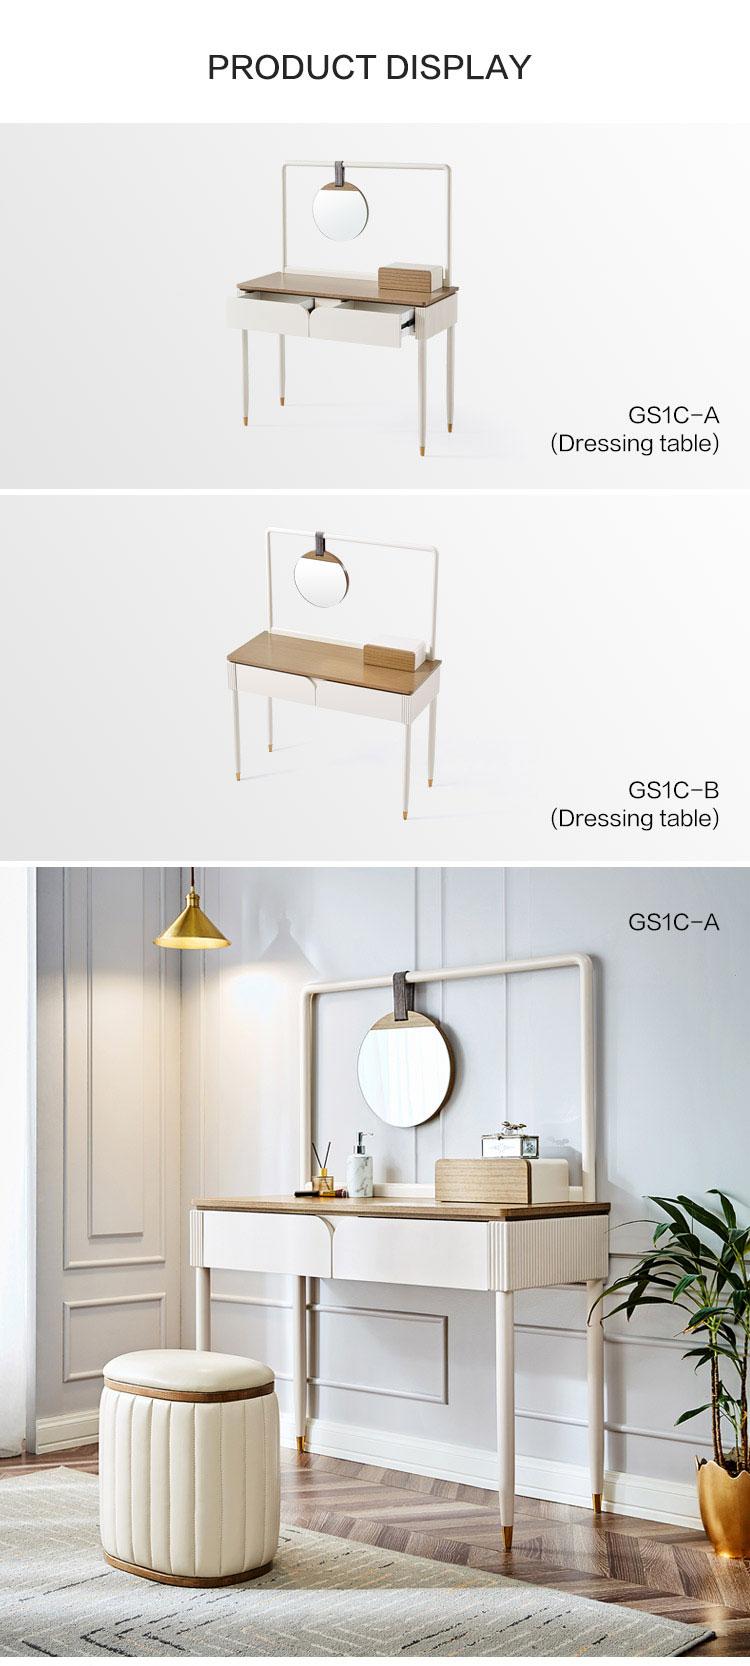 3 7 8 Drawers Wide Wooden Luxury Silver Desk Hair Make Up Mirror Chest Dresser Set For Bedroom